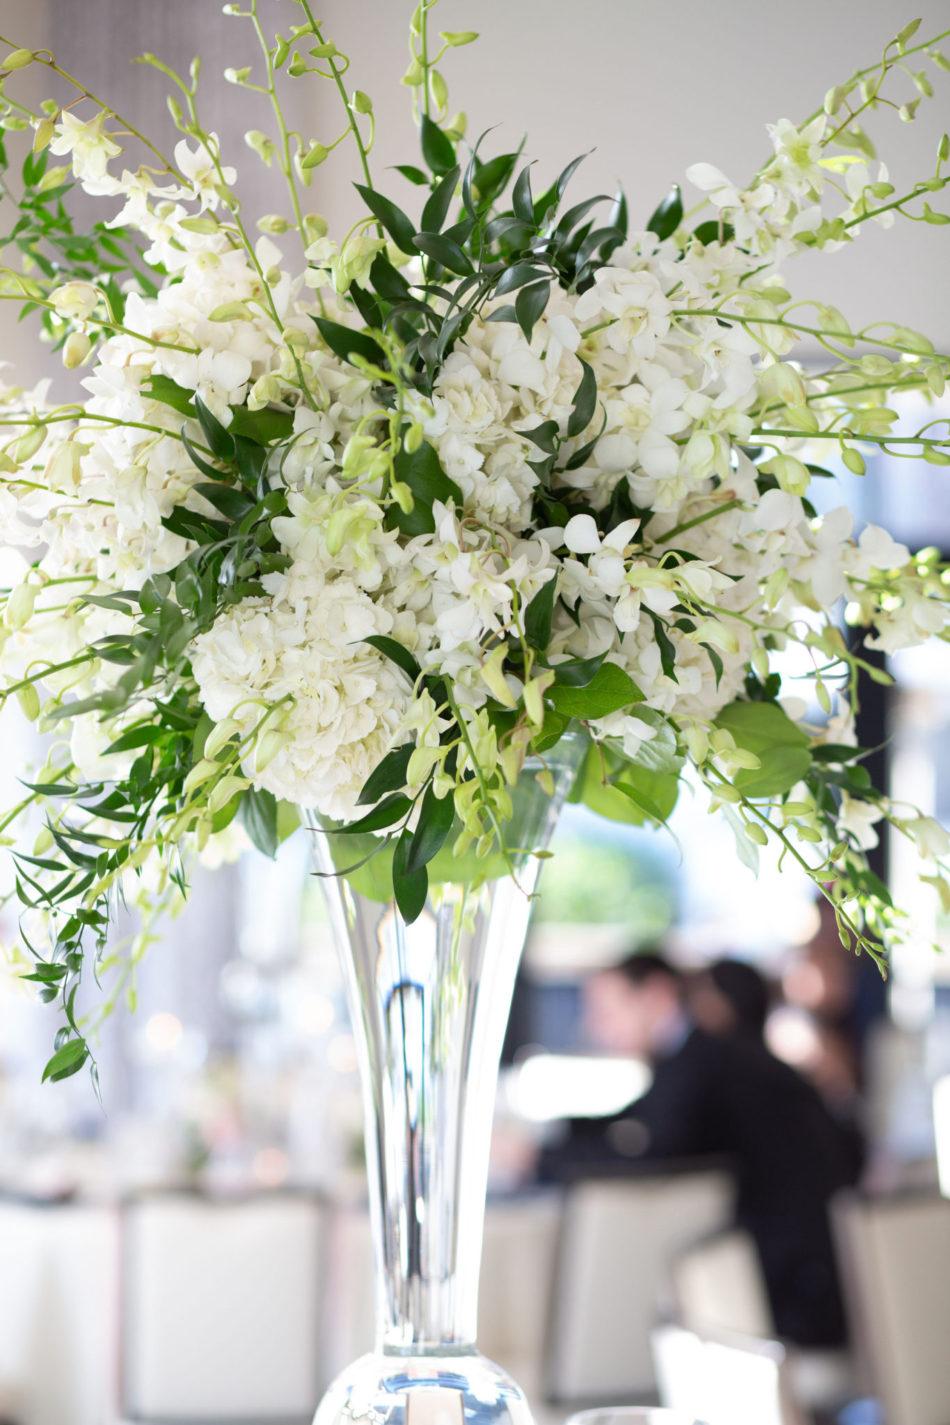 white blooms, white florals, white centerpiece, floral design, florist, wedding florist, wedding flowers, orange county weddings, orange county wedding florist, orange county florist, orange county floral design, flowers by cina